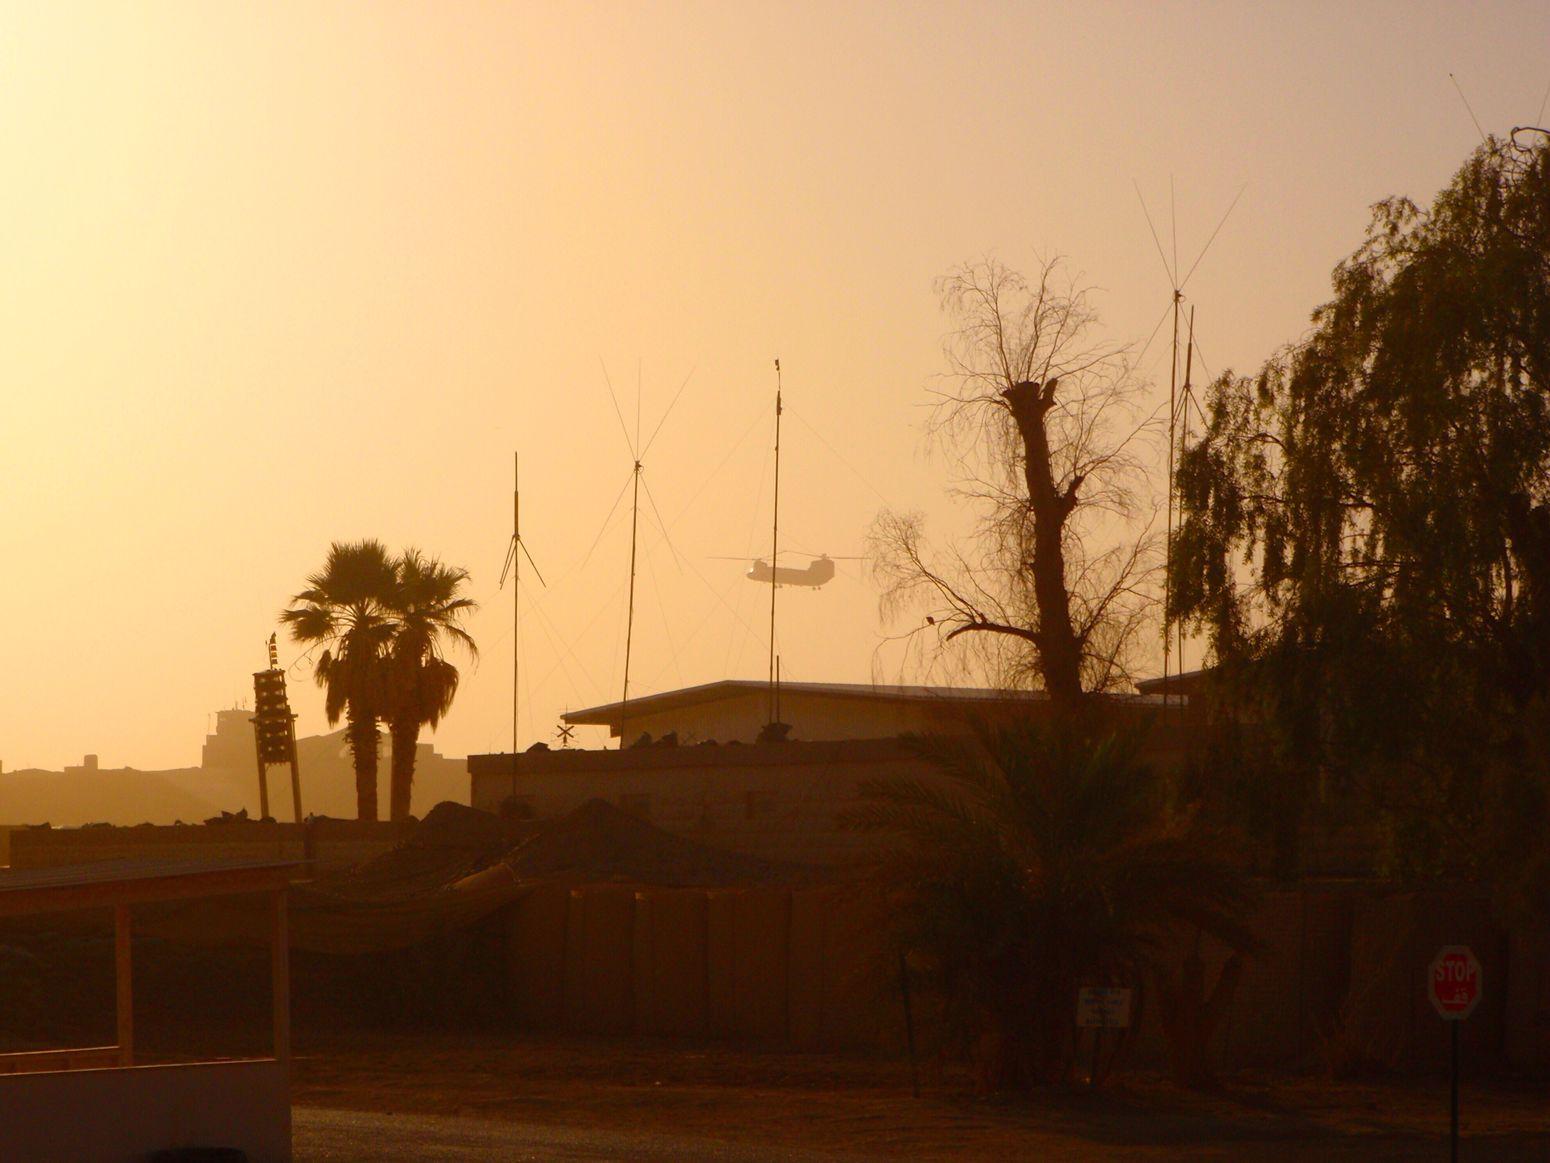 Ramadi Ramadi, Iraq Iraq Helicopter Army Military Gwot Sunset Middle East Politics Aviation 2009-2010 War